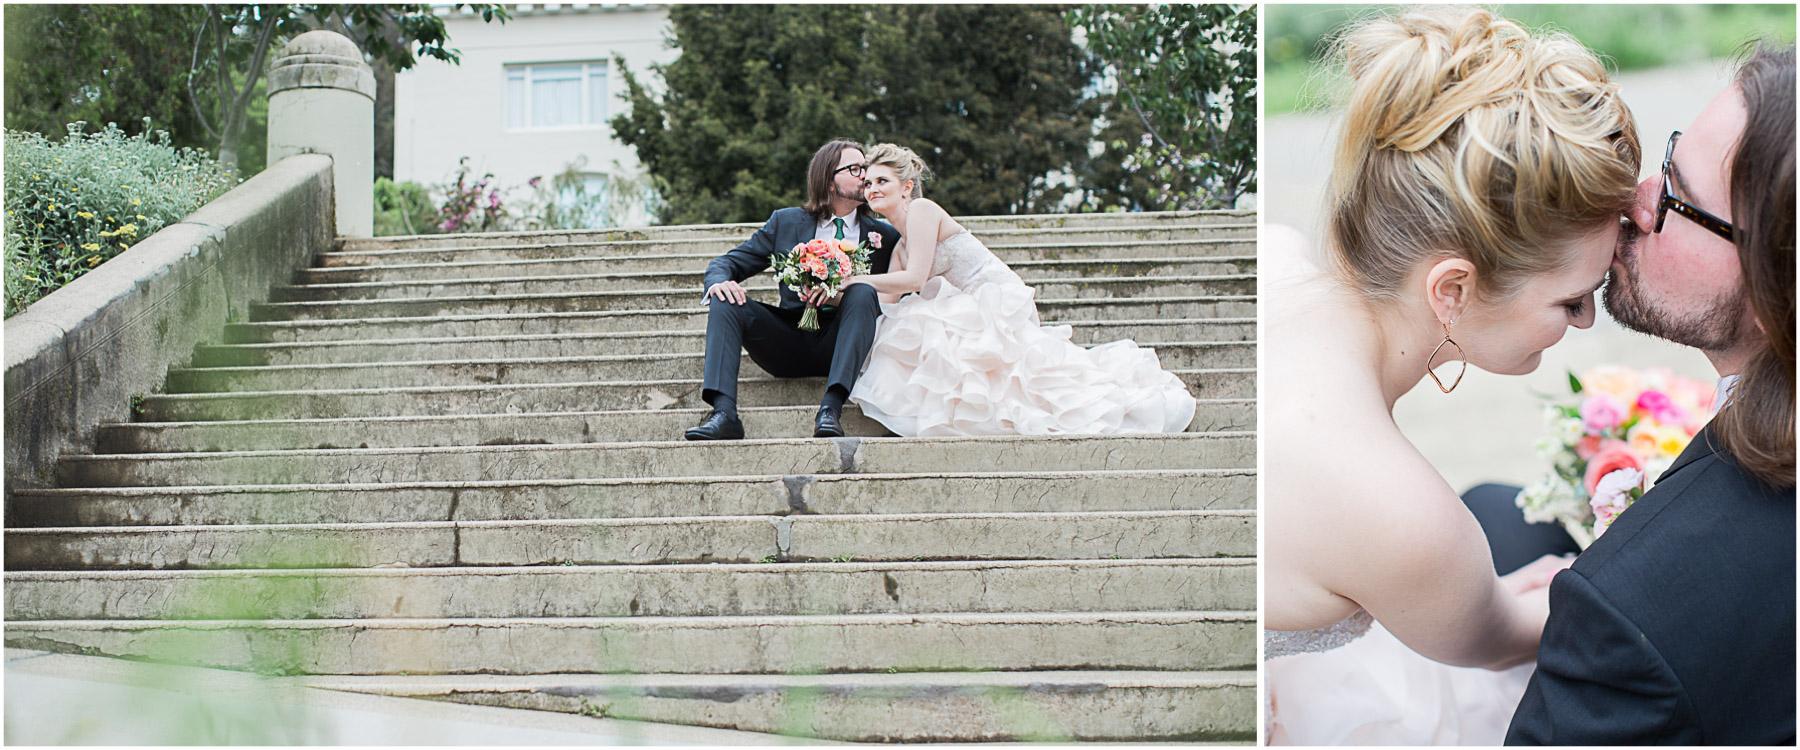 JennaBethPhotography-LEWedding-5.jpg